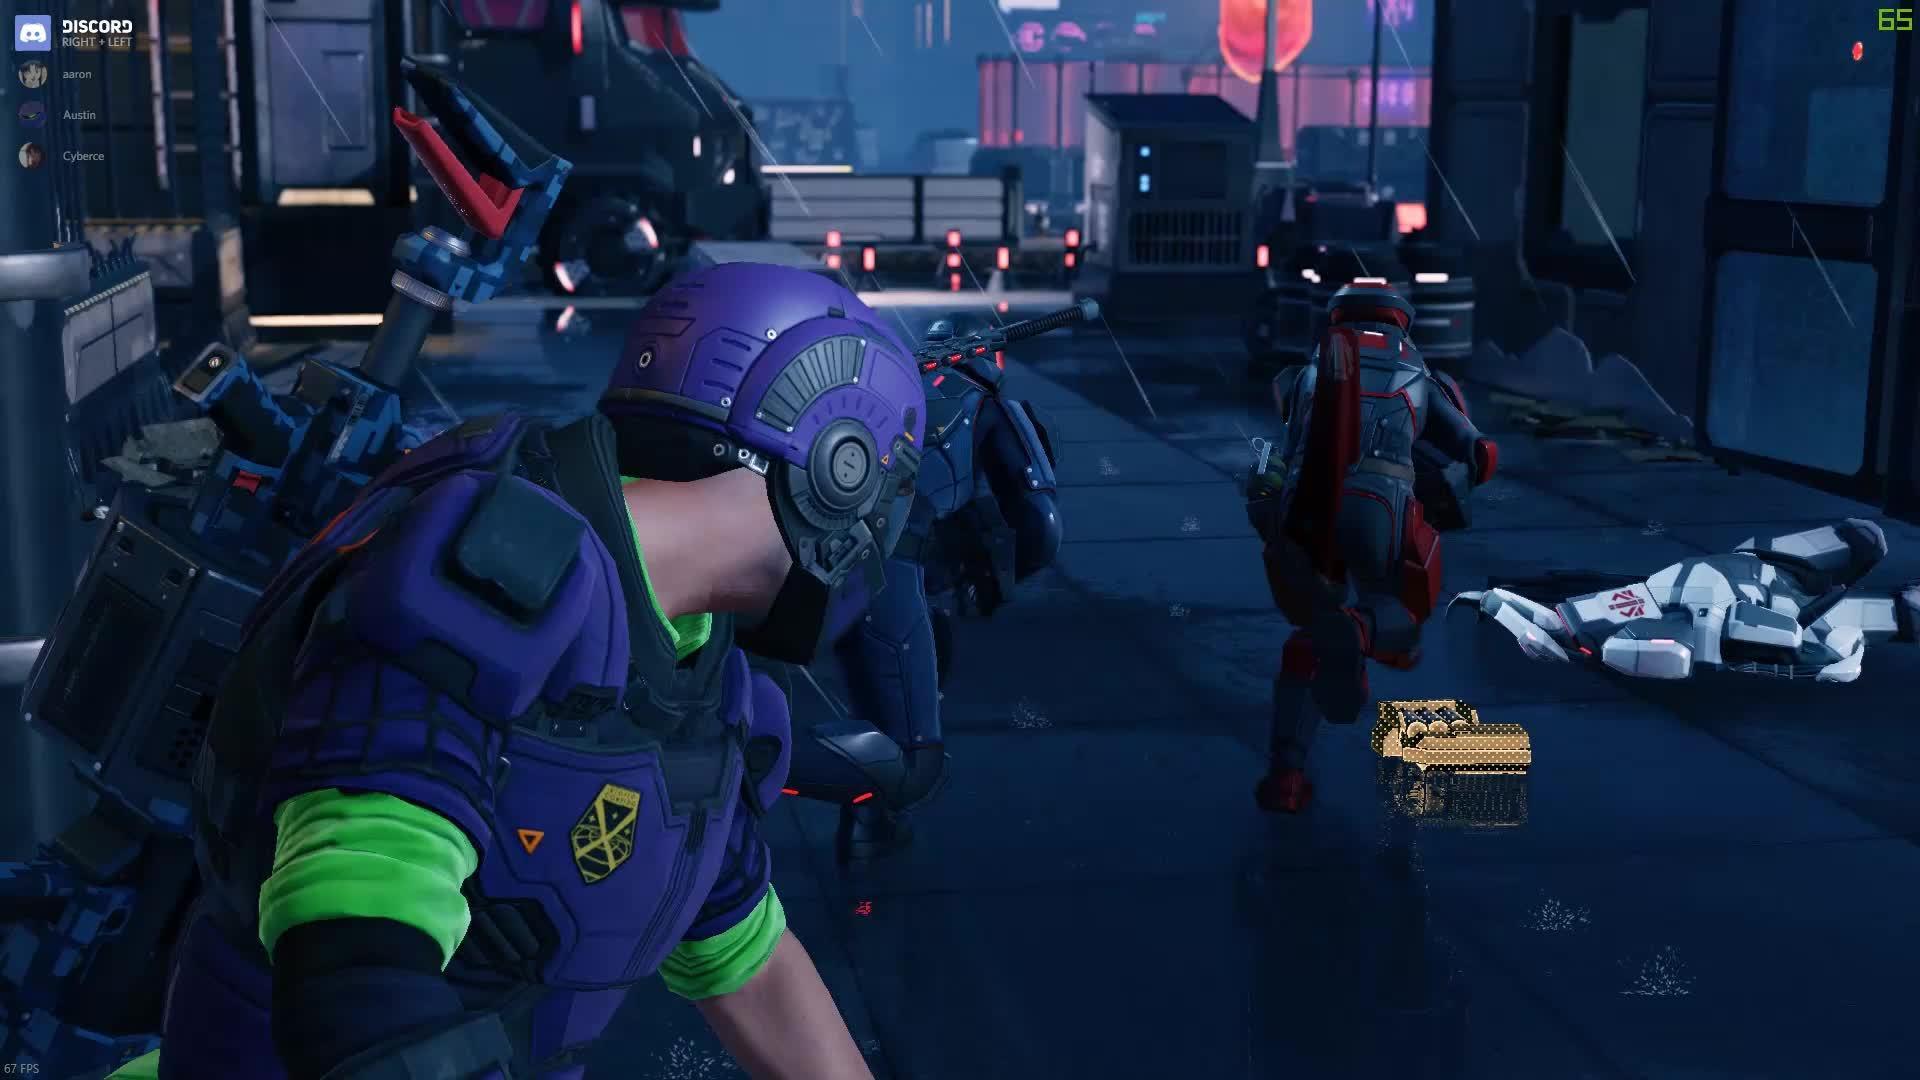 Overwatch in XCOM 2 GIFs